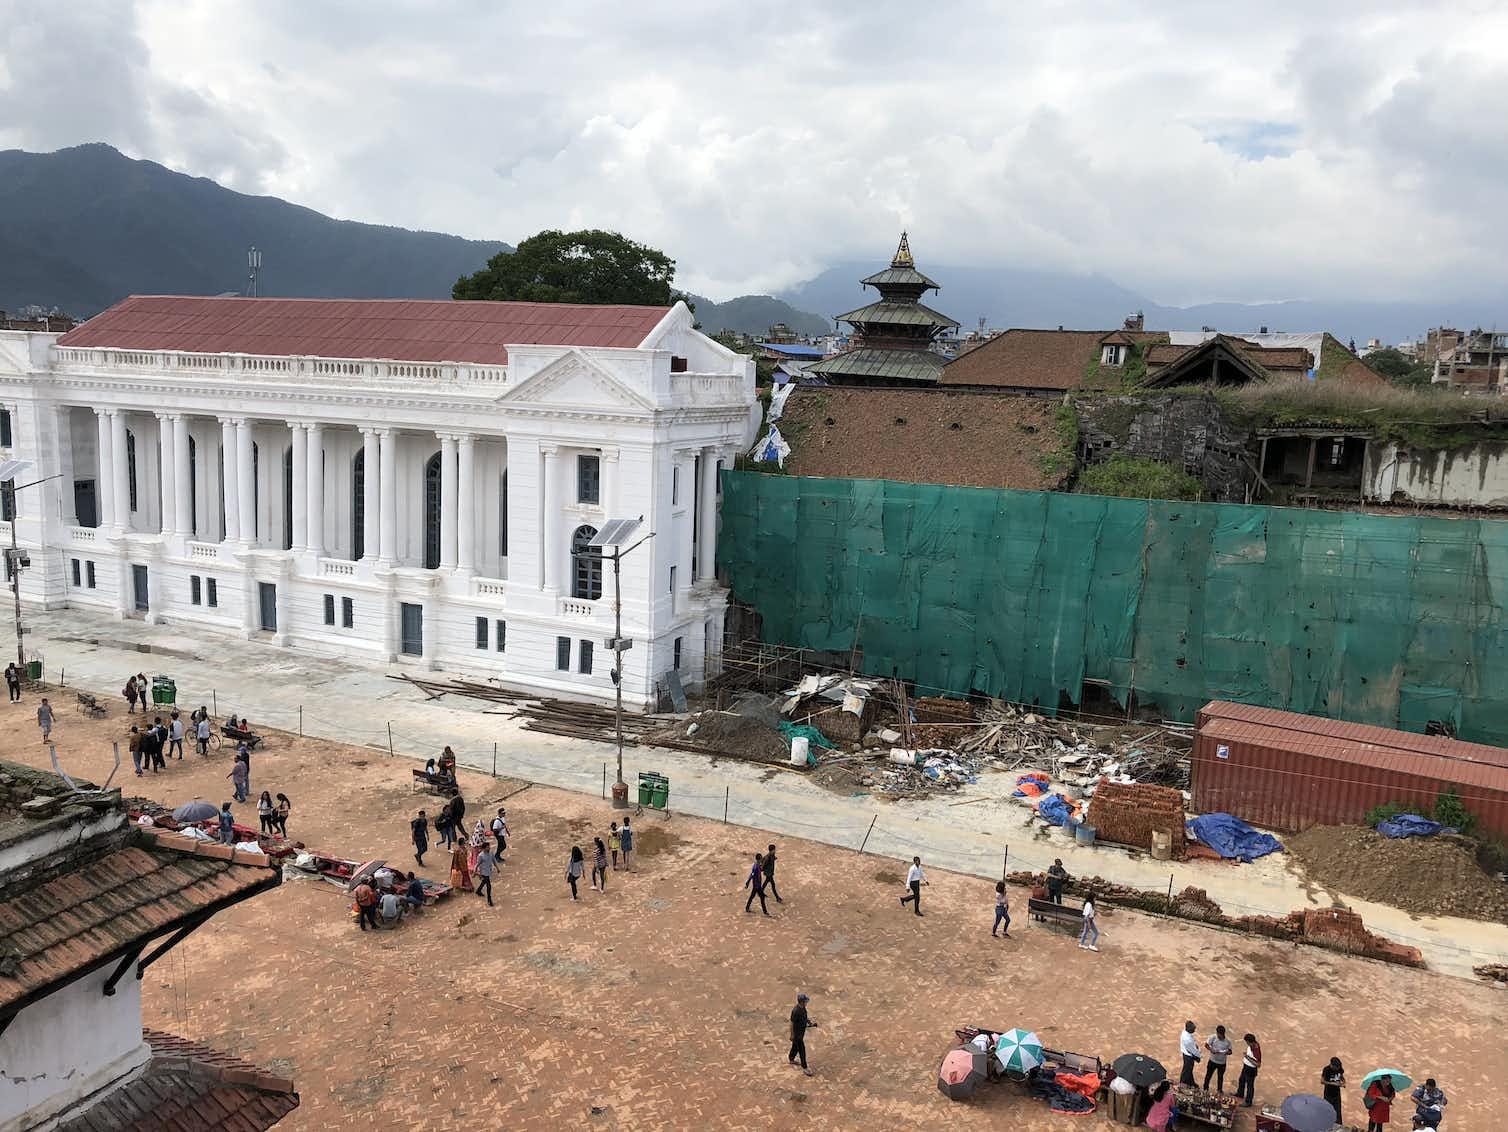 Gaddi Baithak under construction. Photo credit: Urmi Sengupta